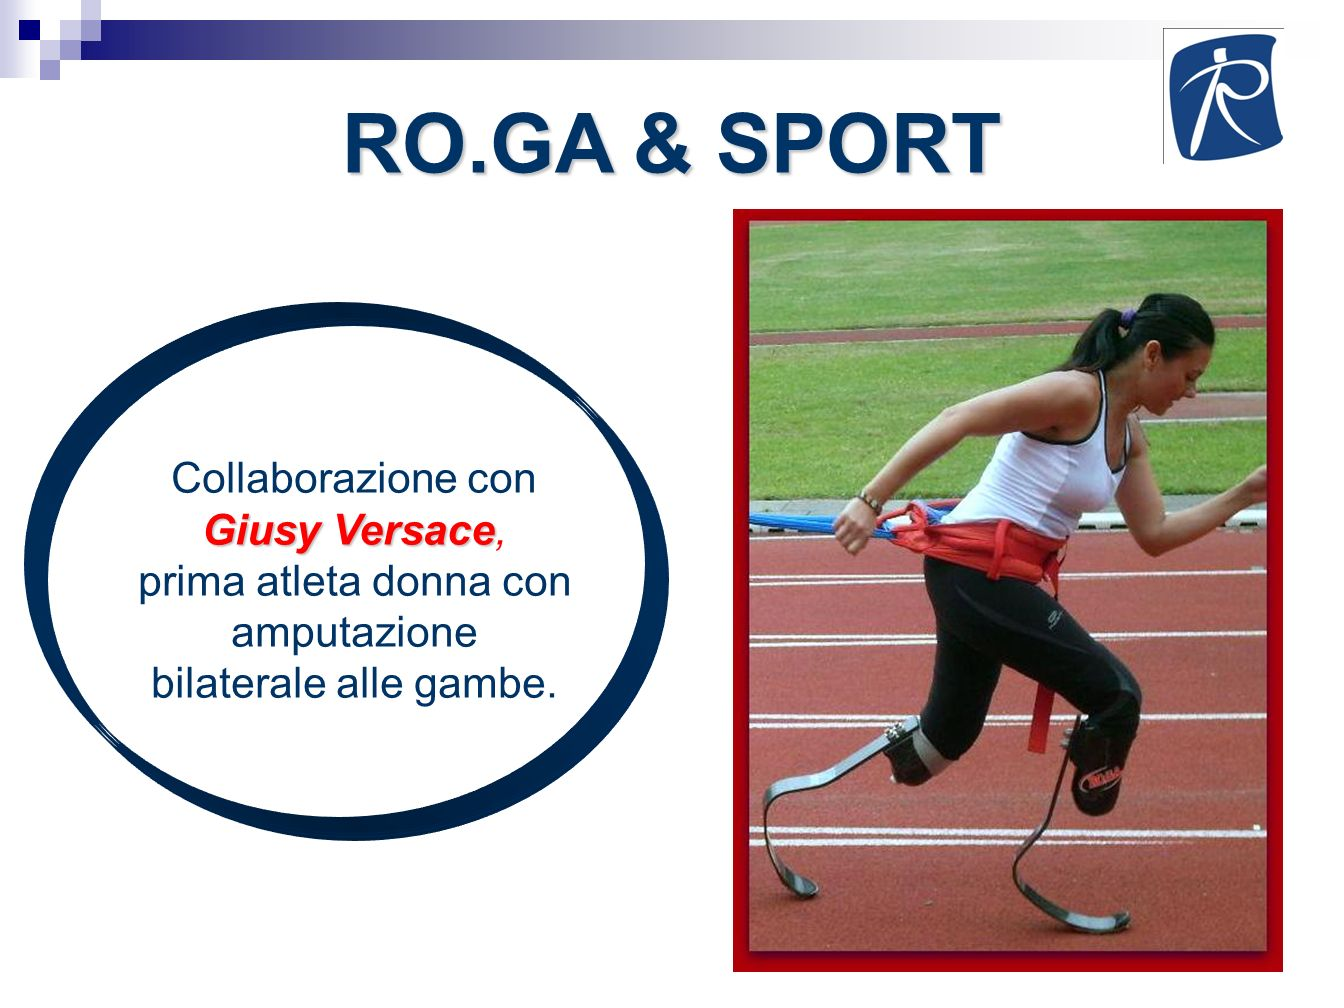 Tel/Fax 0935 41555 Email: info@rogaenna.itinfo@rogaenna.it Ro.Ga srl Centro Ortopedico